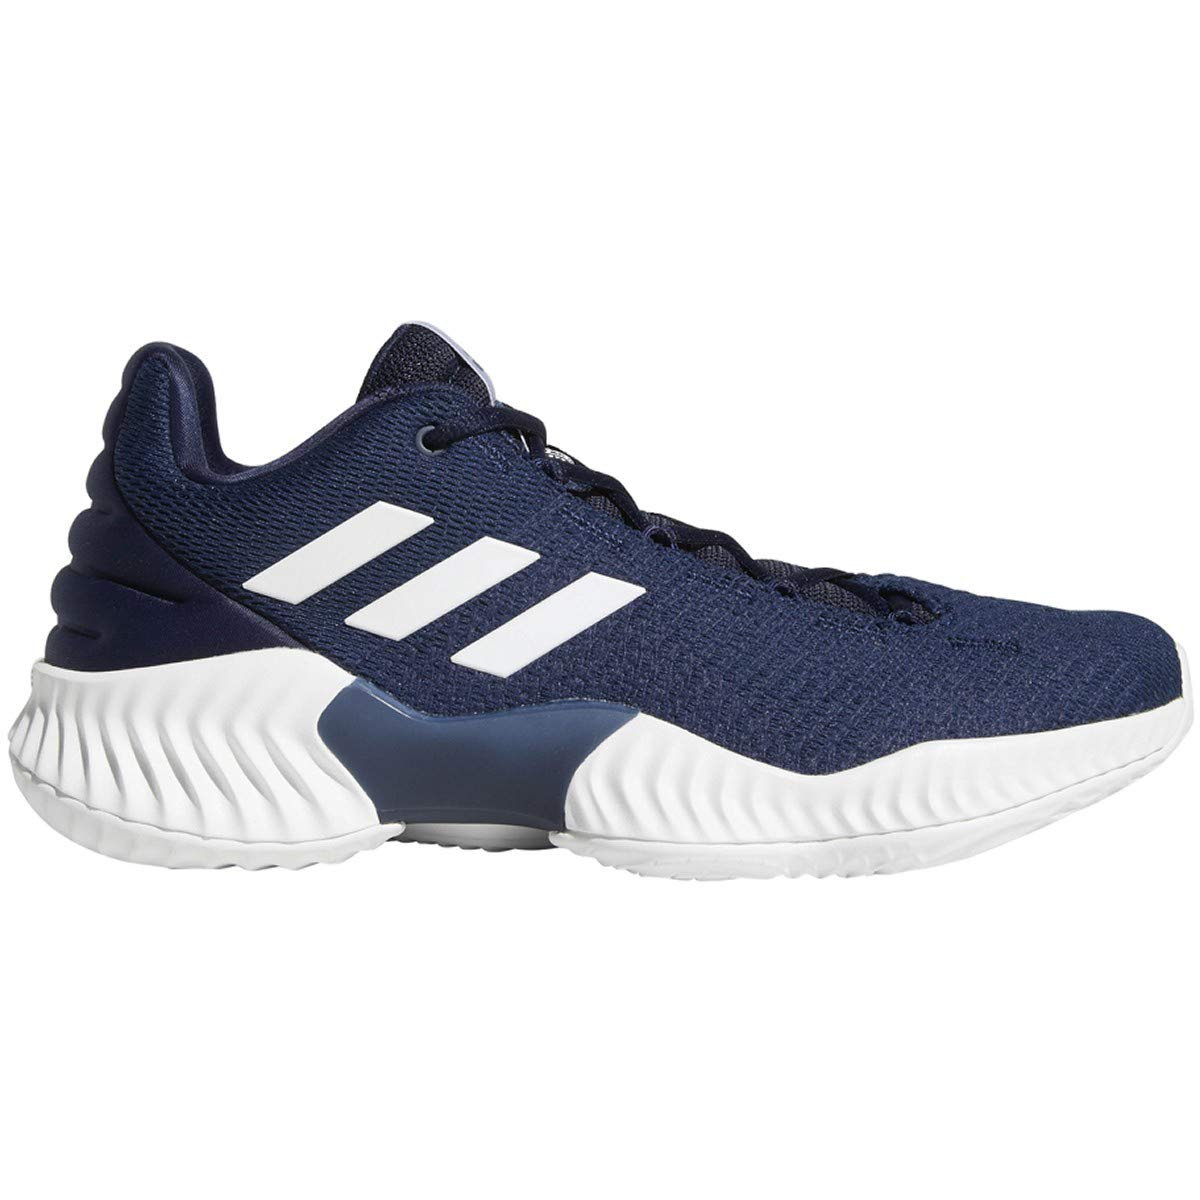 Buy Adidas Pro Bounce 2018 Low Shoe